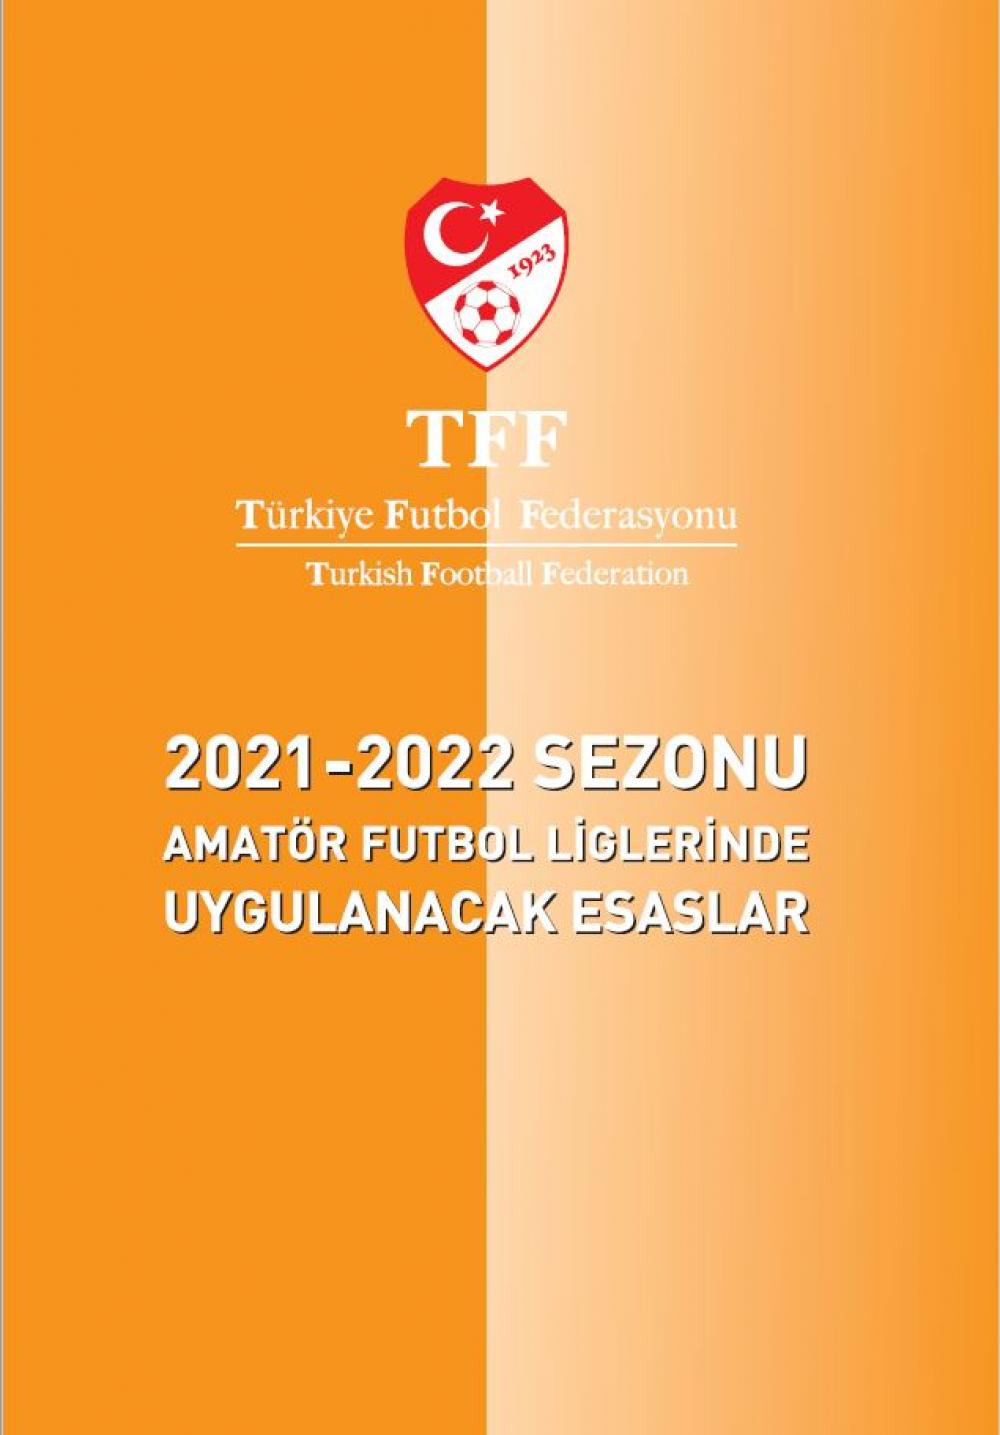 2021 2022 futbol sezonu amator futbol ligleri kitapcigi